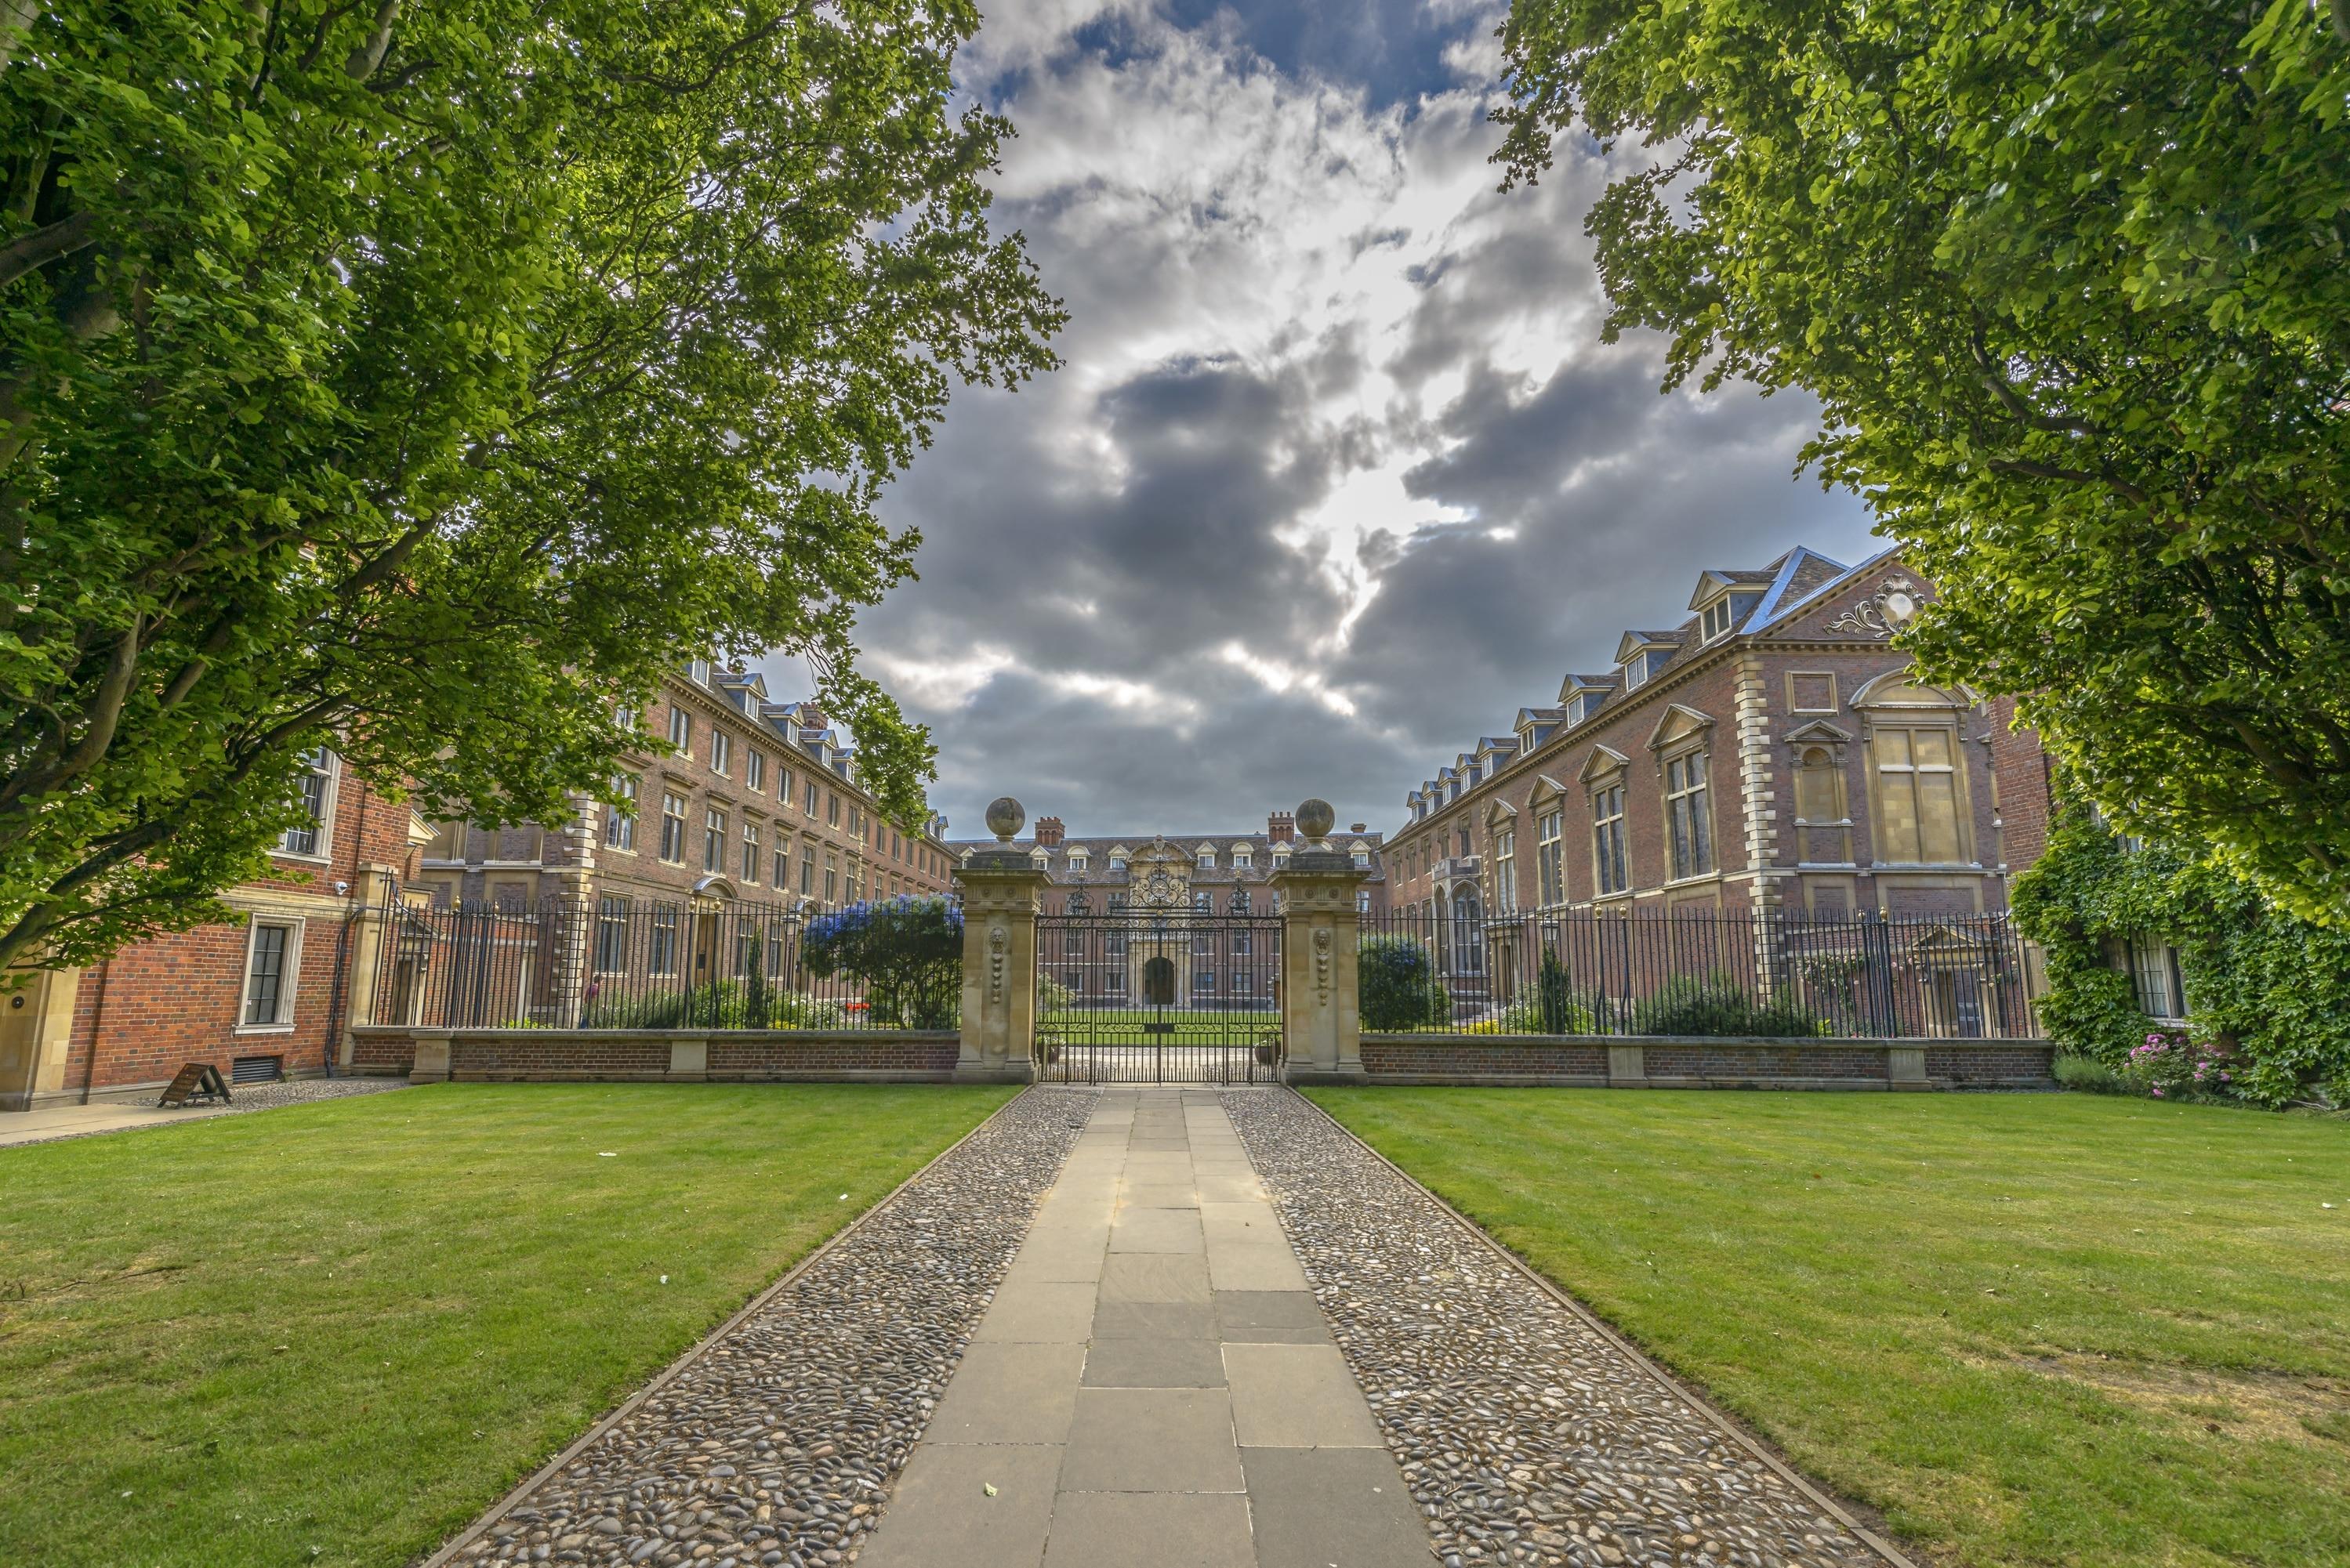 St Catharine's College (université), Cambridge, Angleterre, Royaume-Uni